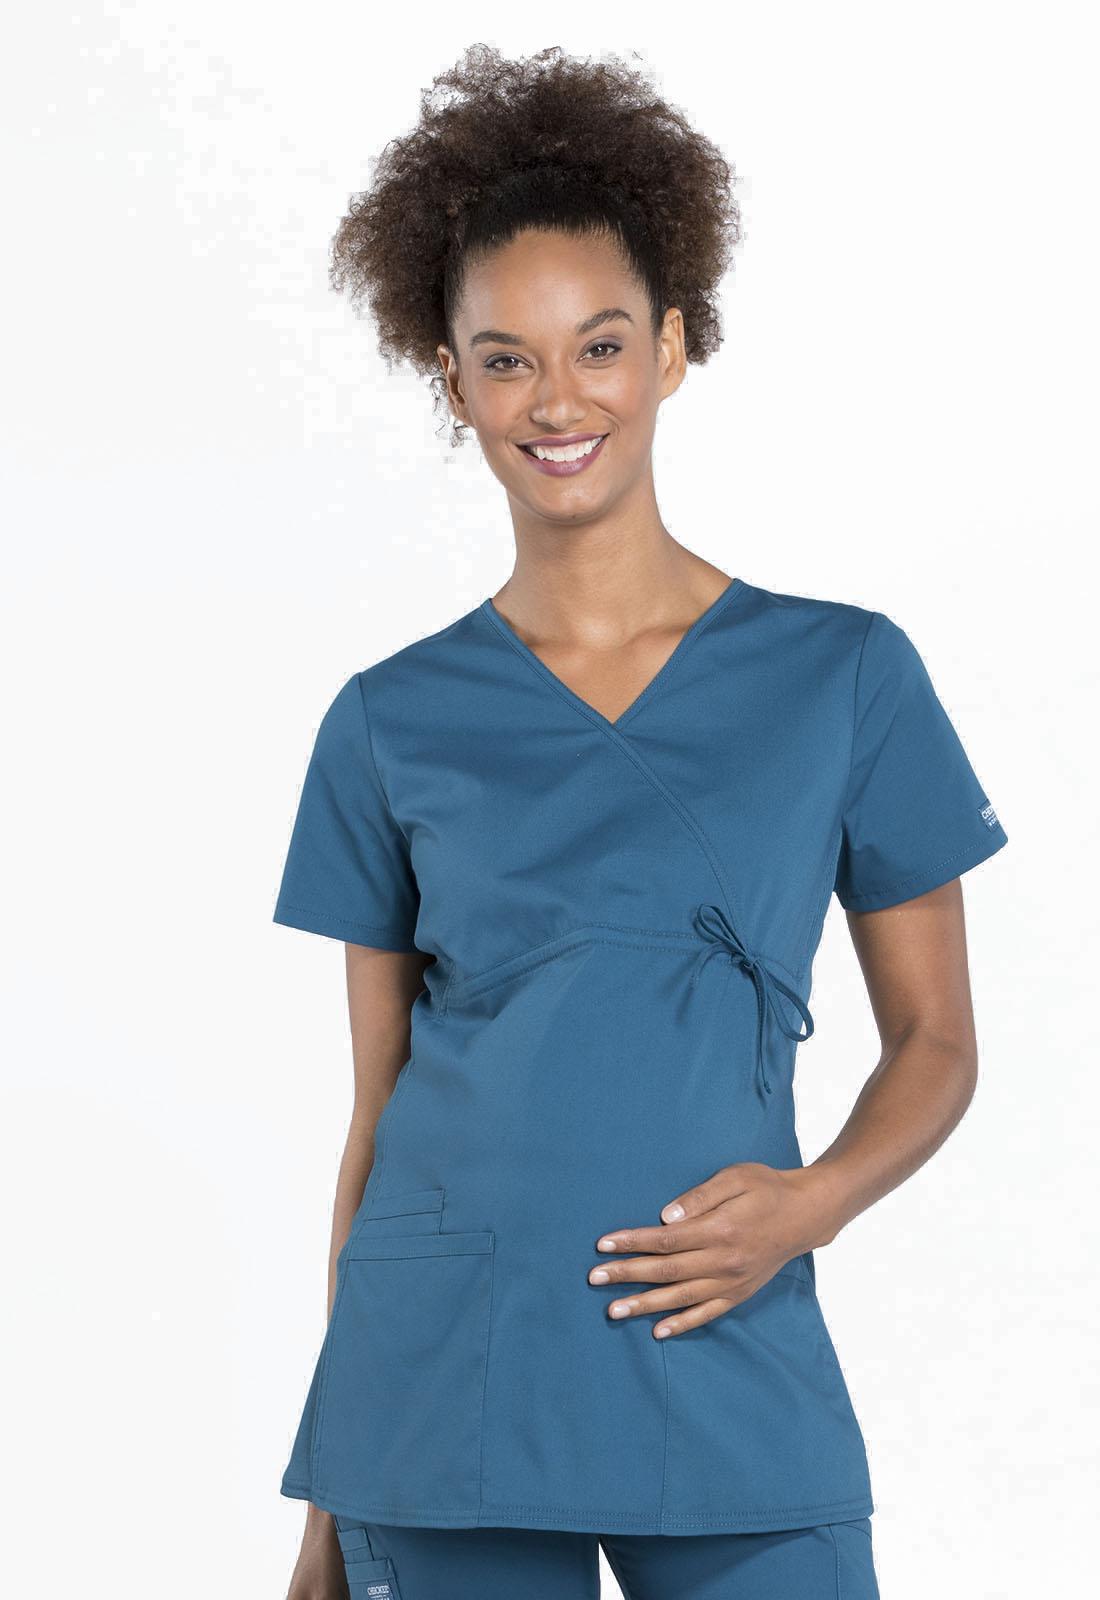 cee85b53de95e WW Professionals Maternity Mock Wrap Top in Caribbean Blue WW685-CAR ...